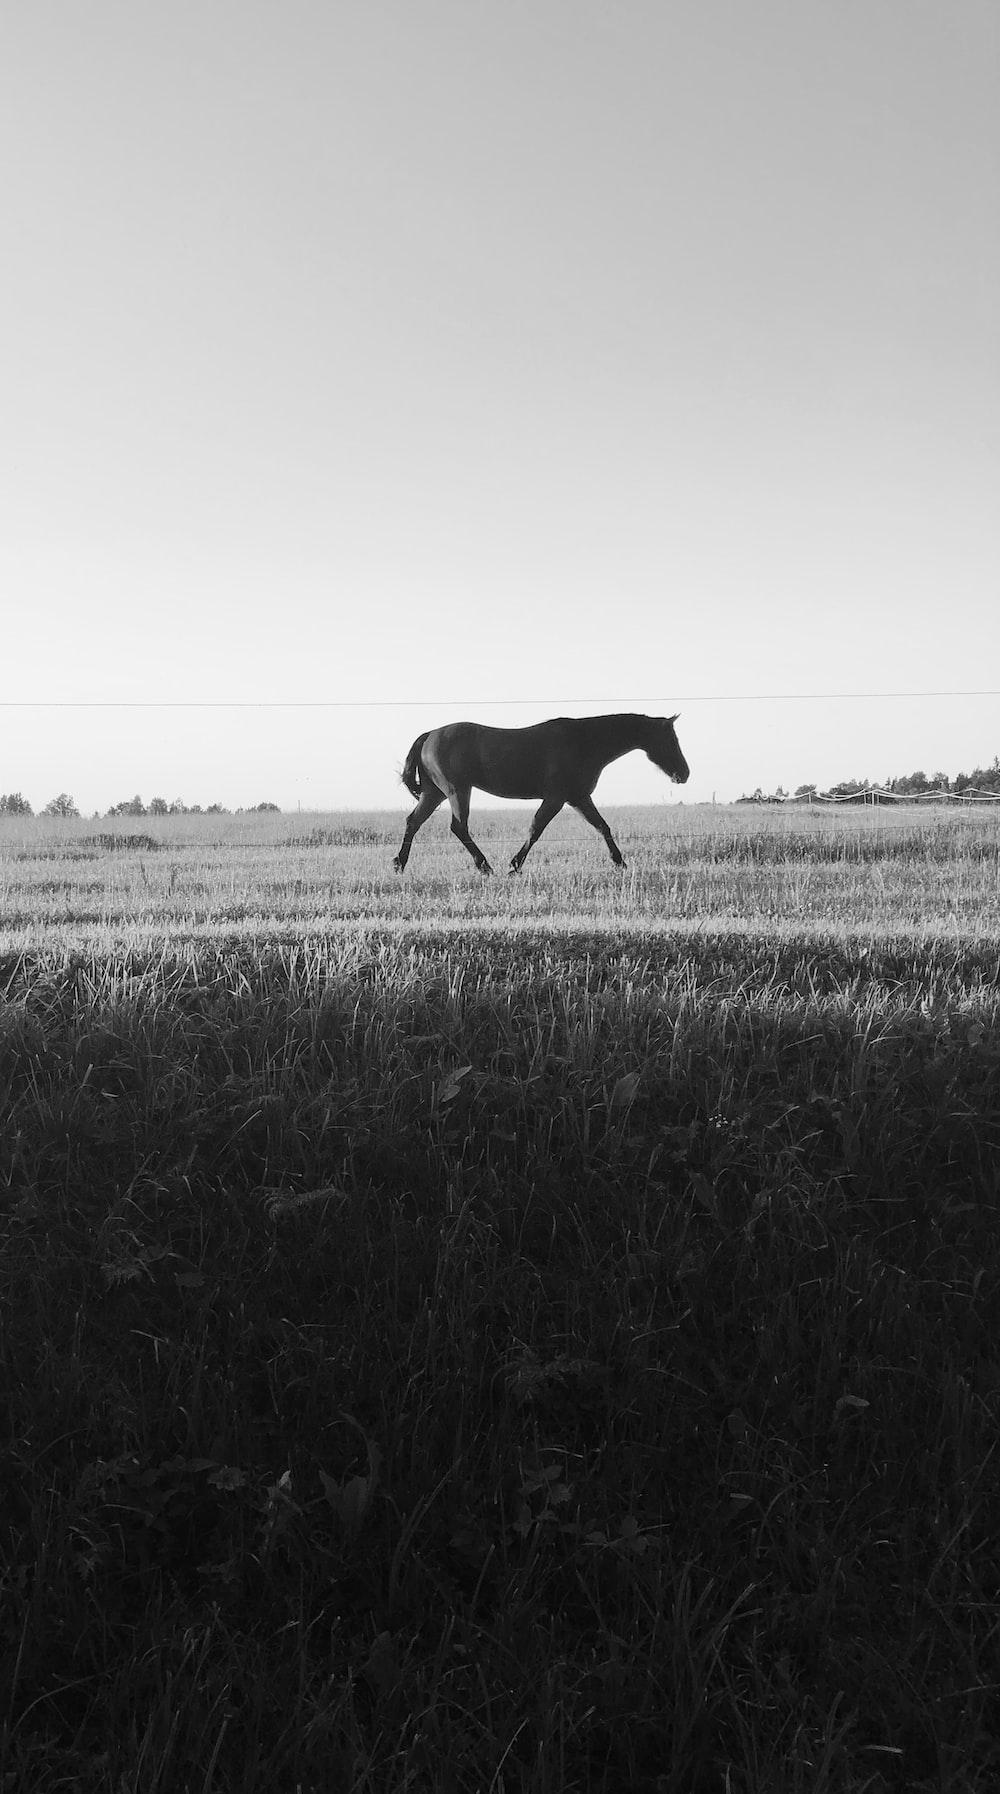 black horse on grass field